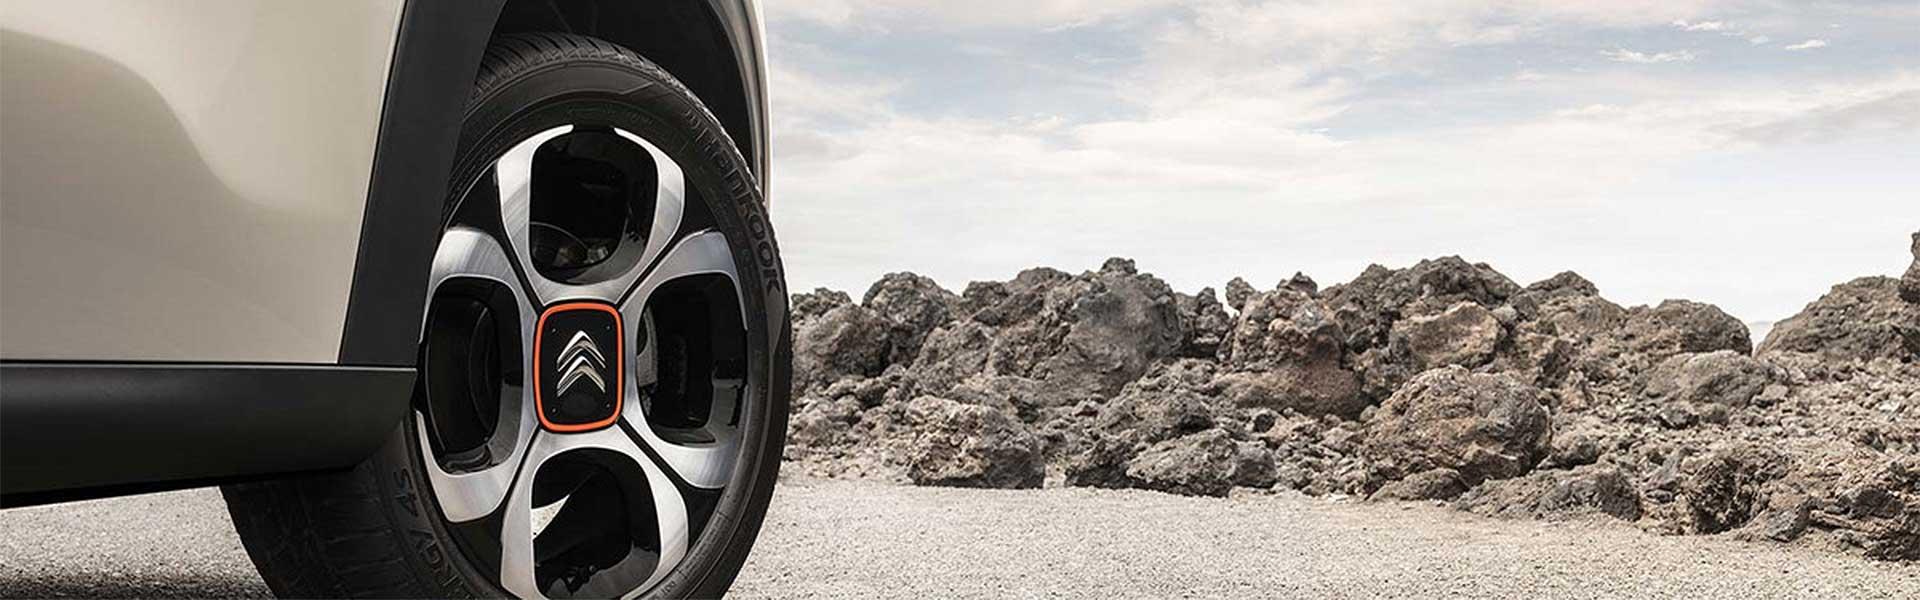 Vendita auto plurimarca nuove, usate e km zero | Sini Motorsport Ladispoli